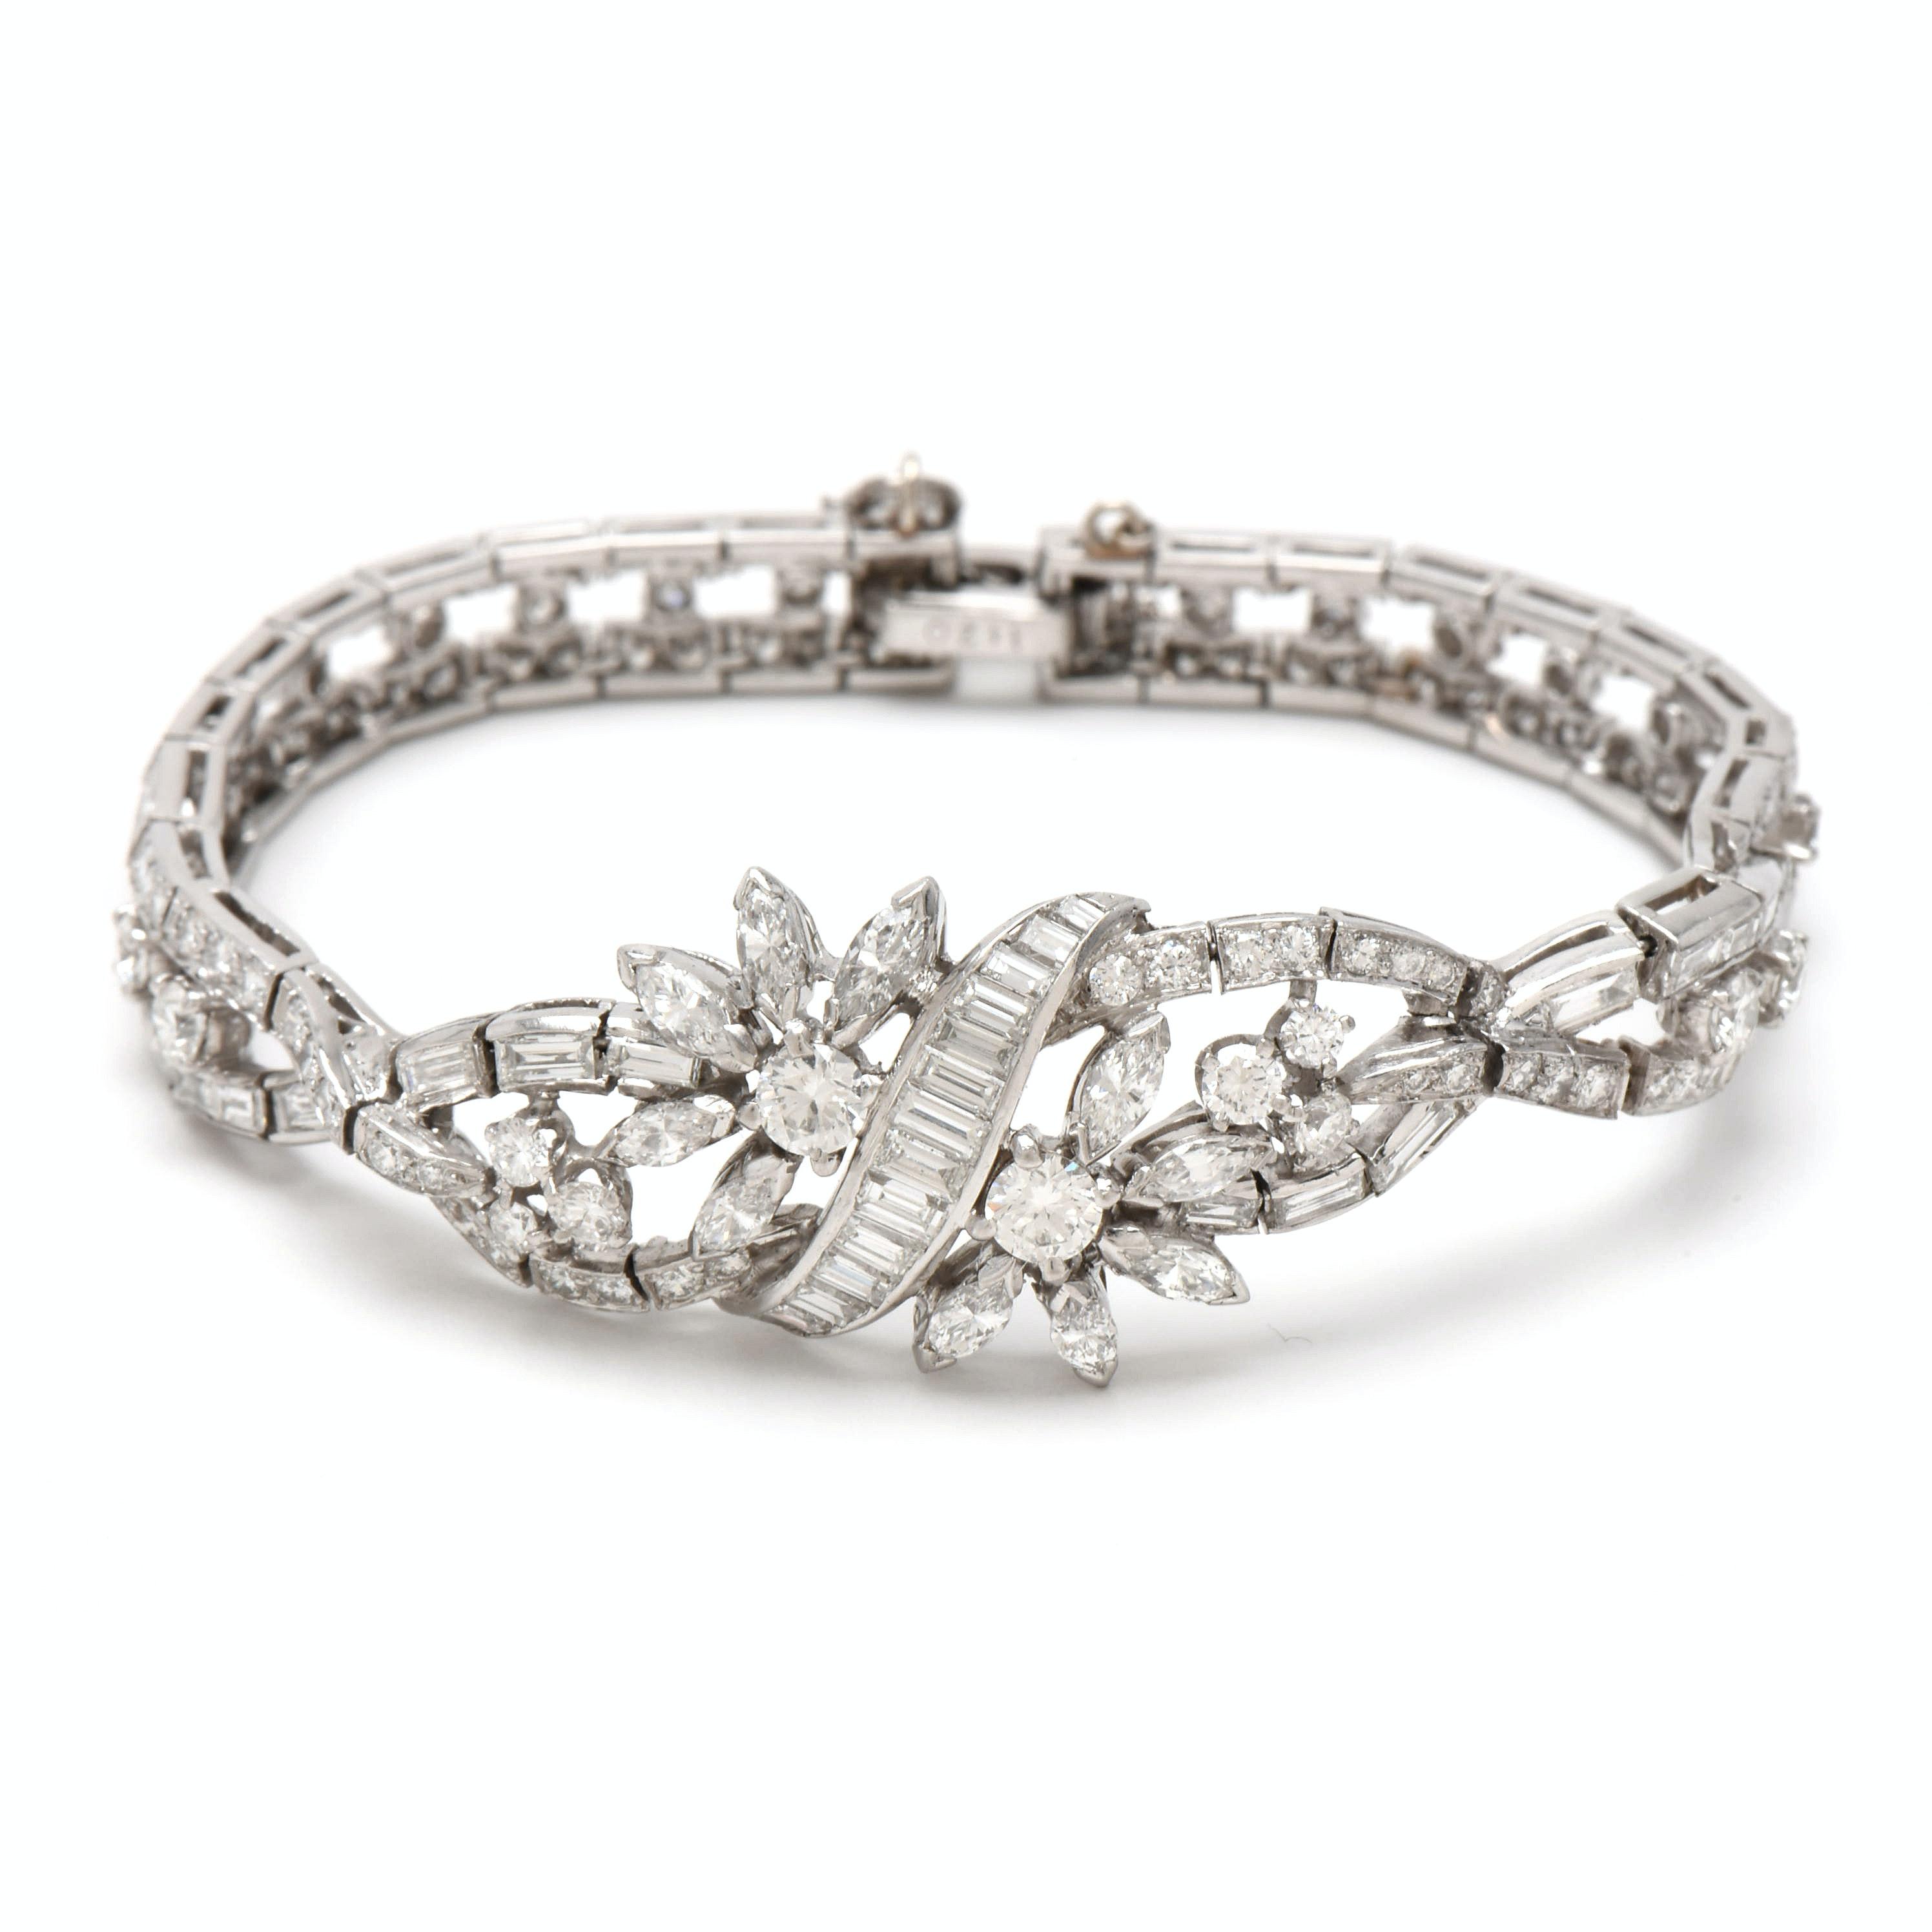 Platinum 8.49 CTW Diamond Bracelet with 14K White Gold Safety Chain